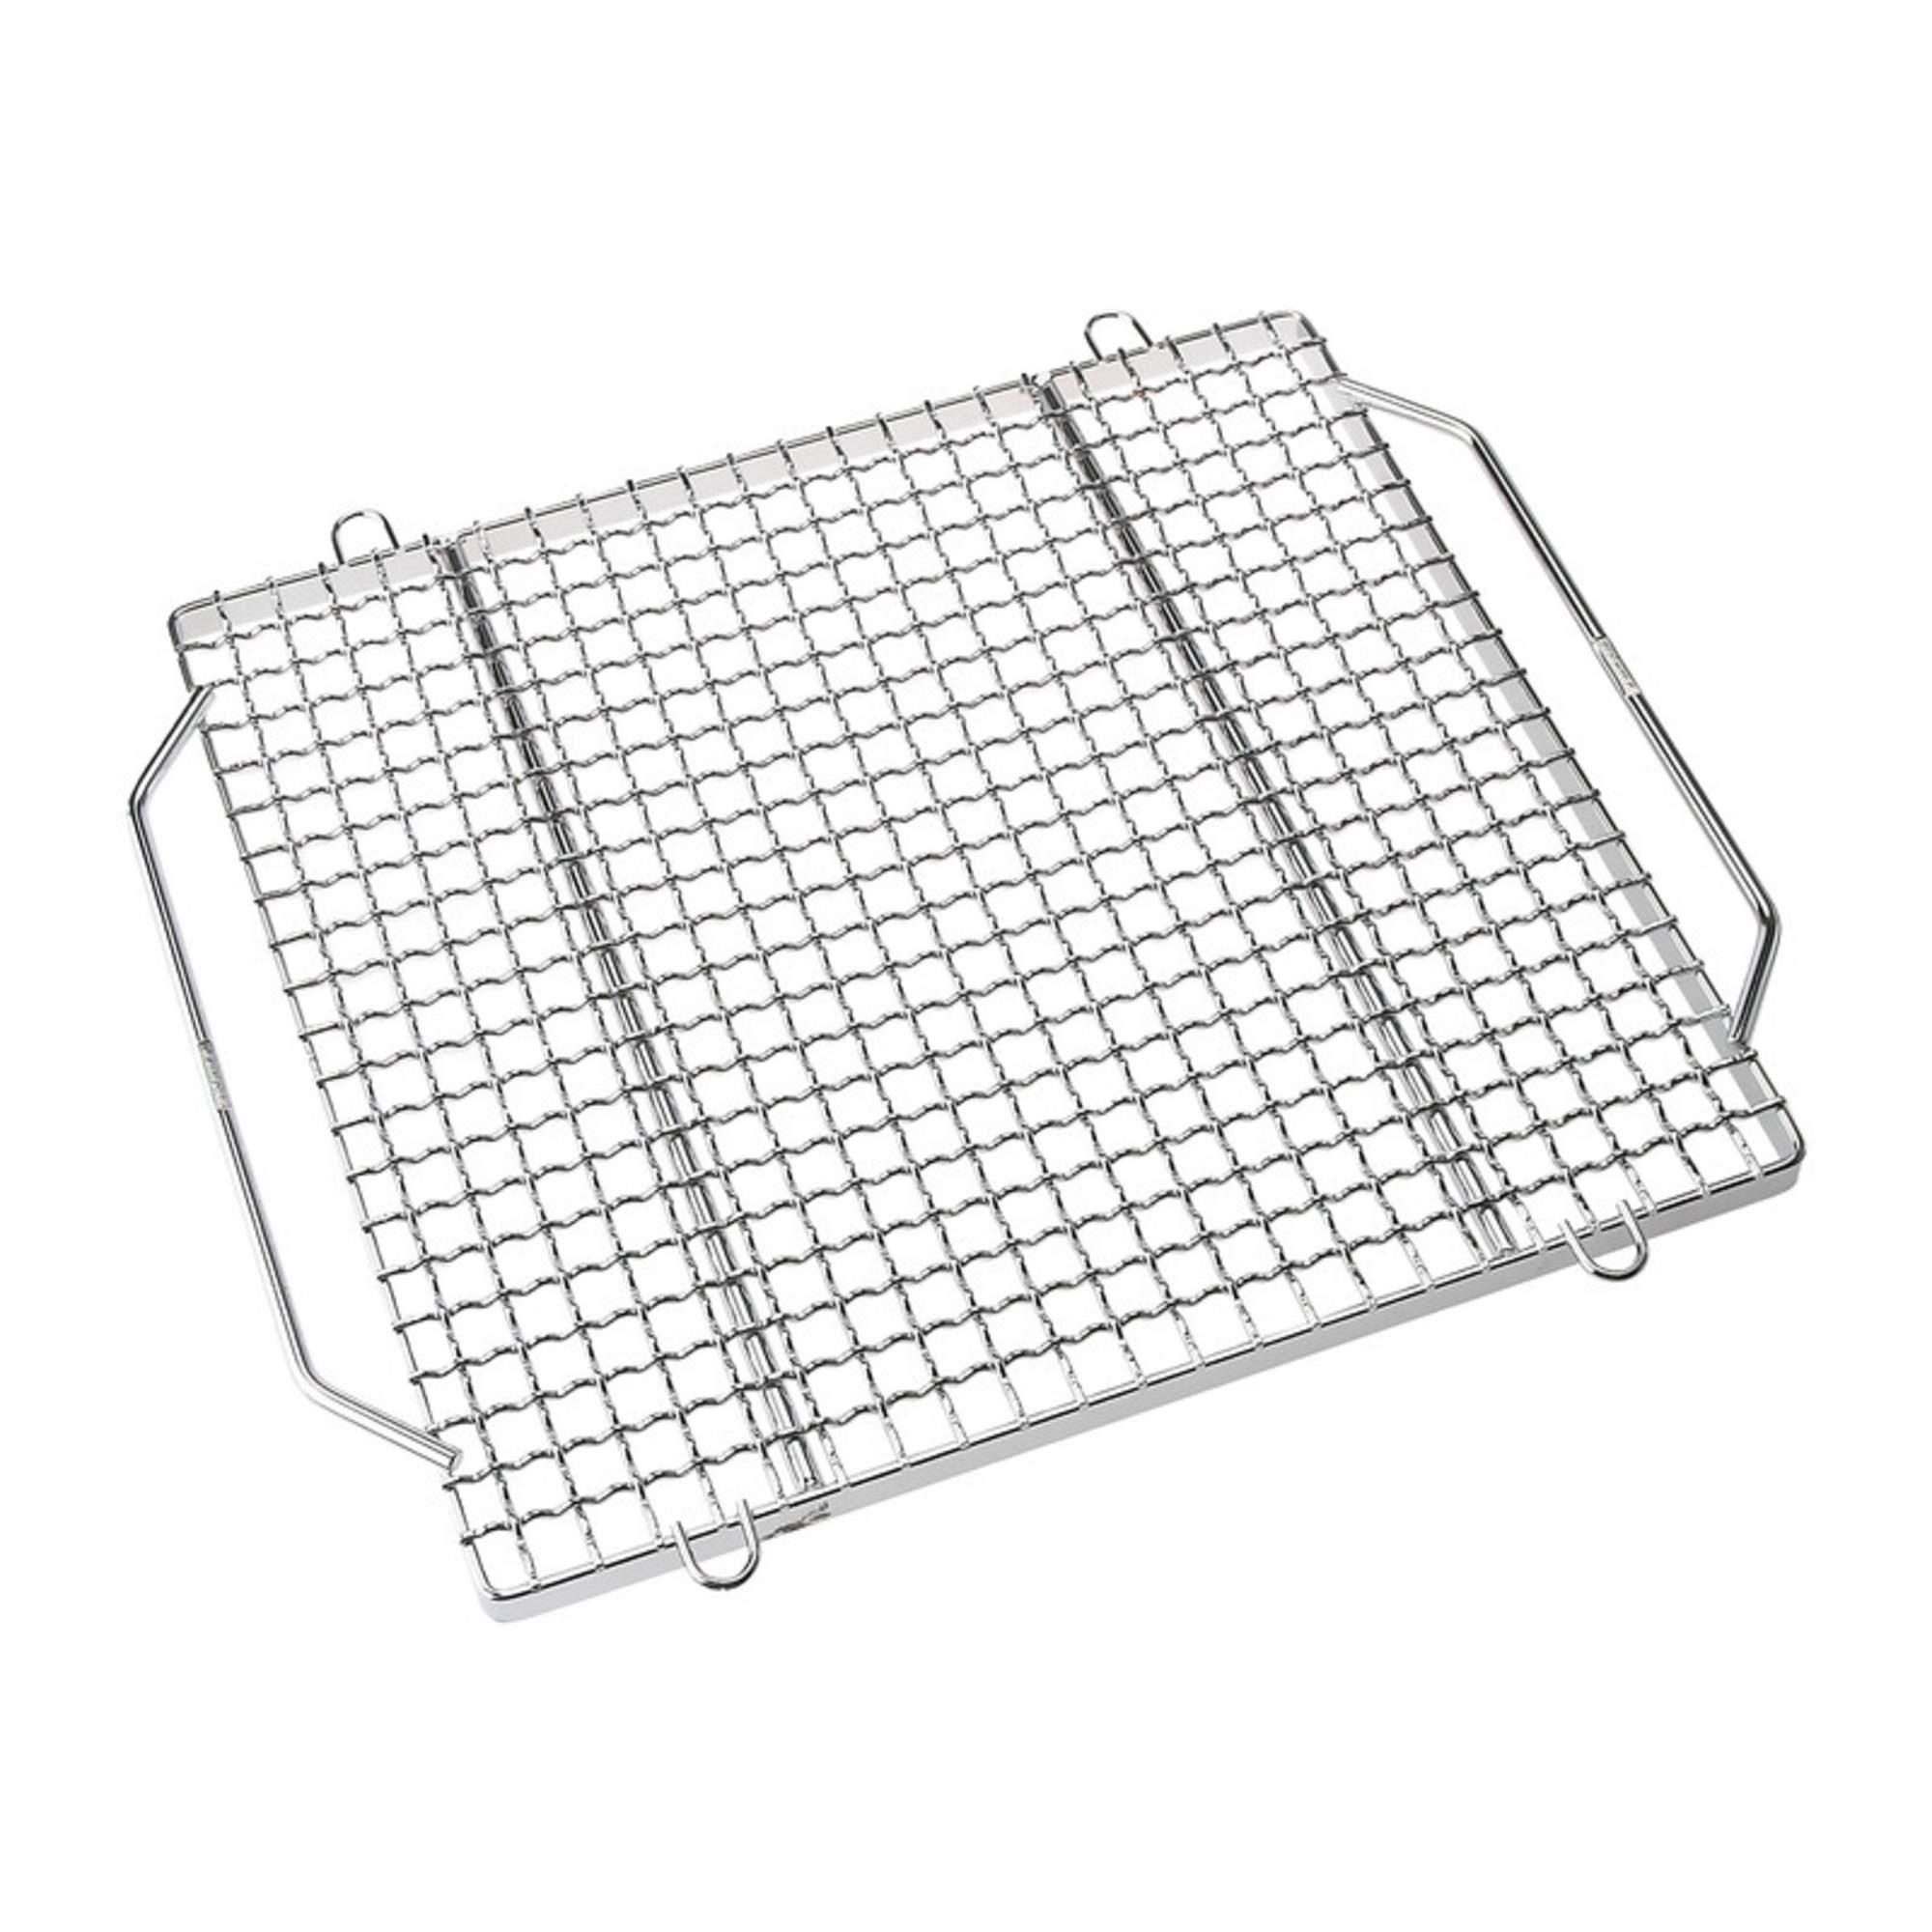 camping und outdoorprodukte grillroste kohlegrills. Black Bedroom Furniture Sets. Home Design Ideas